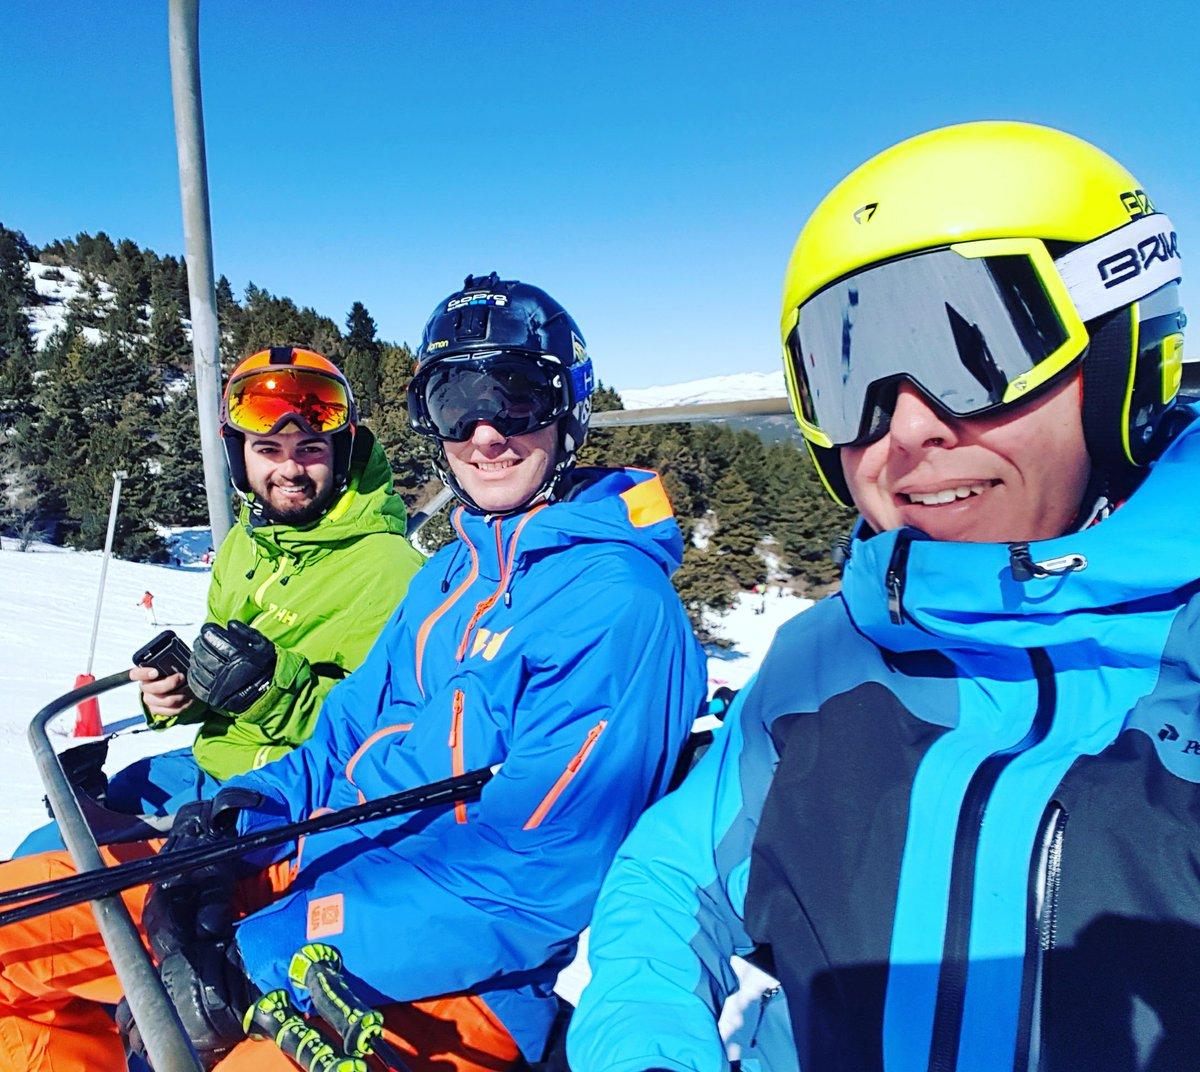 Espectacular @SnowLaMolina y @MasellaPirineu #alp2500 #esqui #nevasport https://t.co/PNklJHAEbI